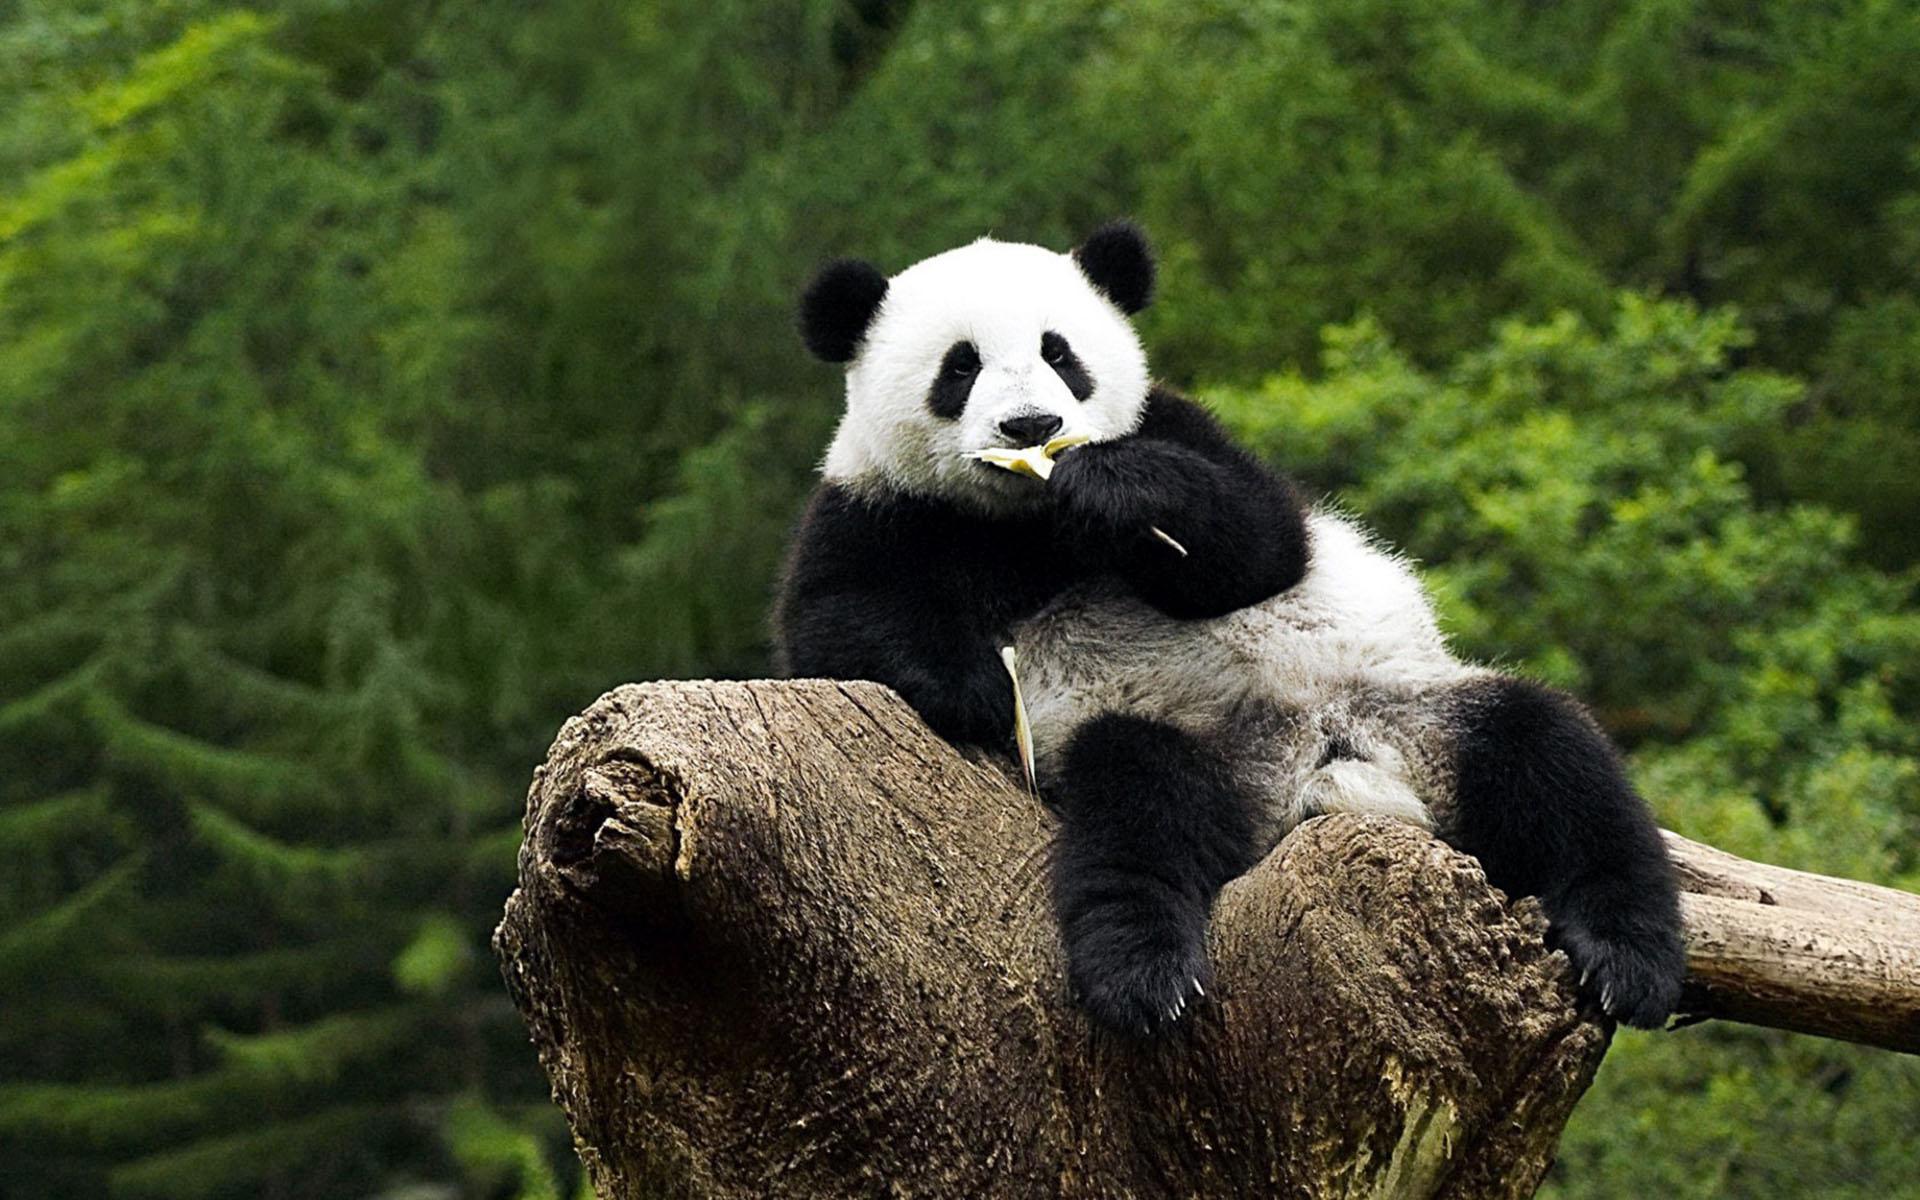 Panda HD Wallpapers | 7wallpapers.net